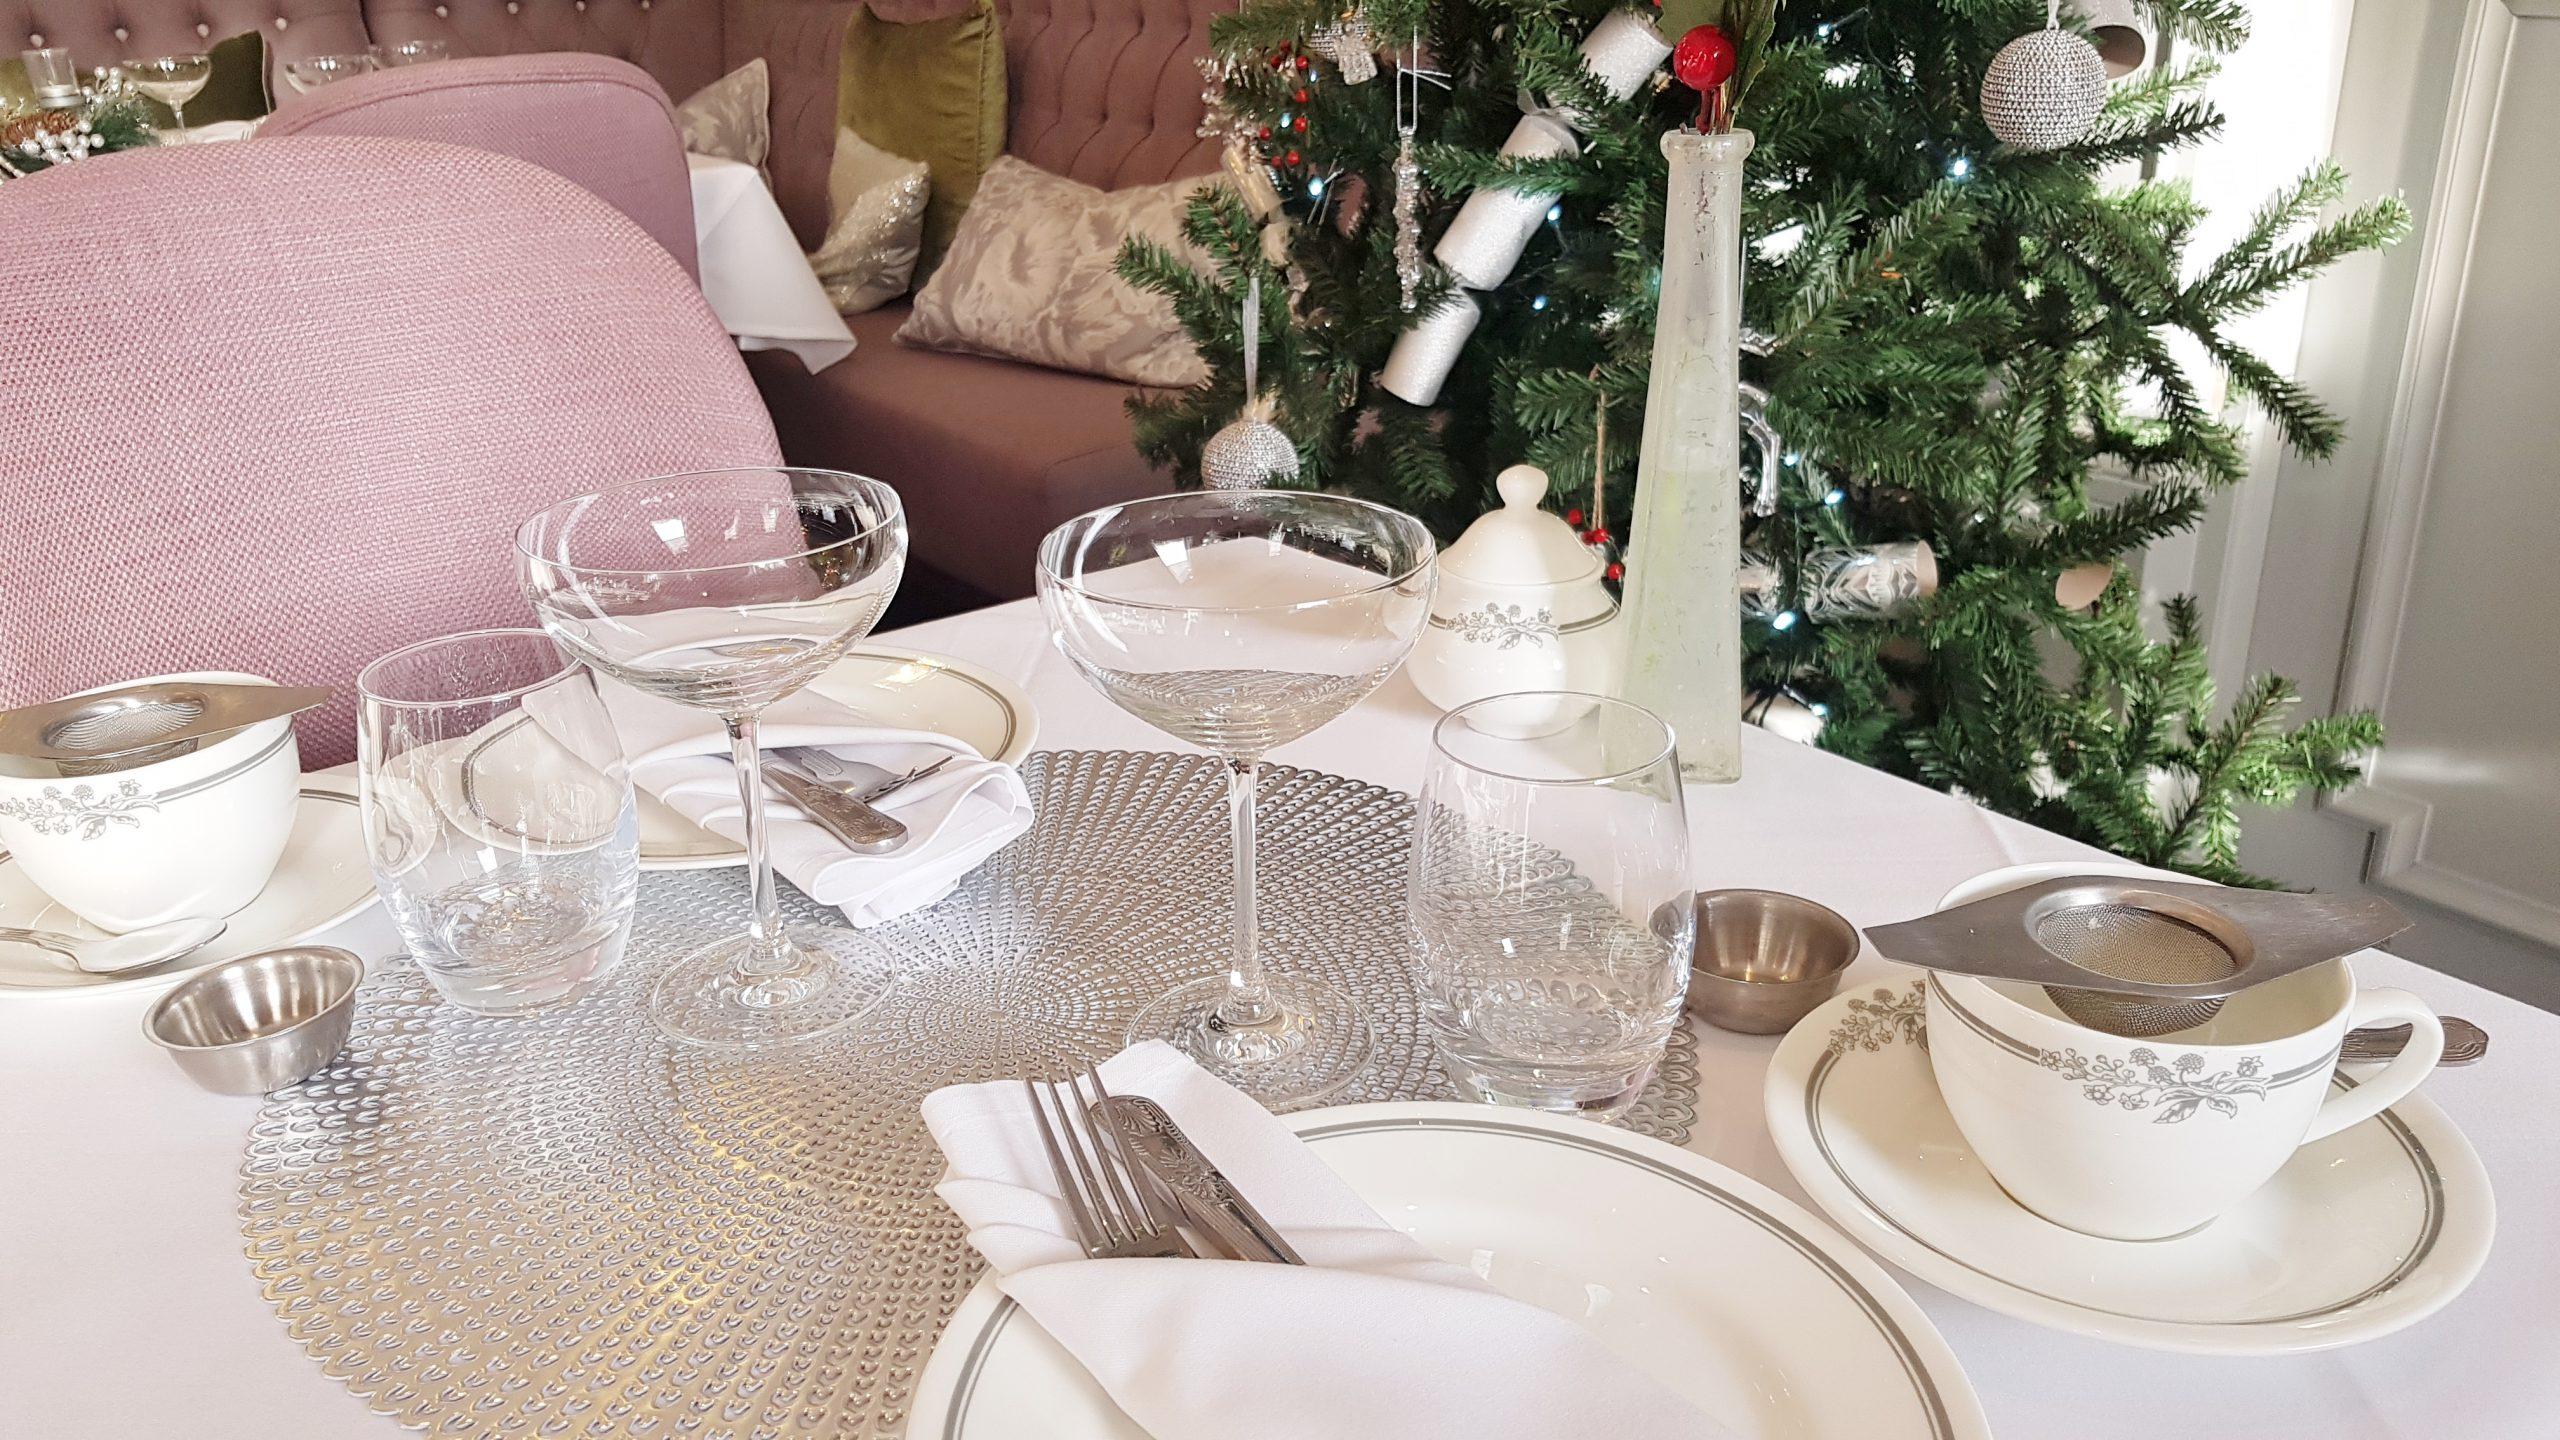 Festive Afternoon Tea at The Laura Ashley Tea Room, Burnham Beeches